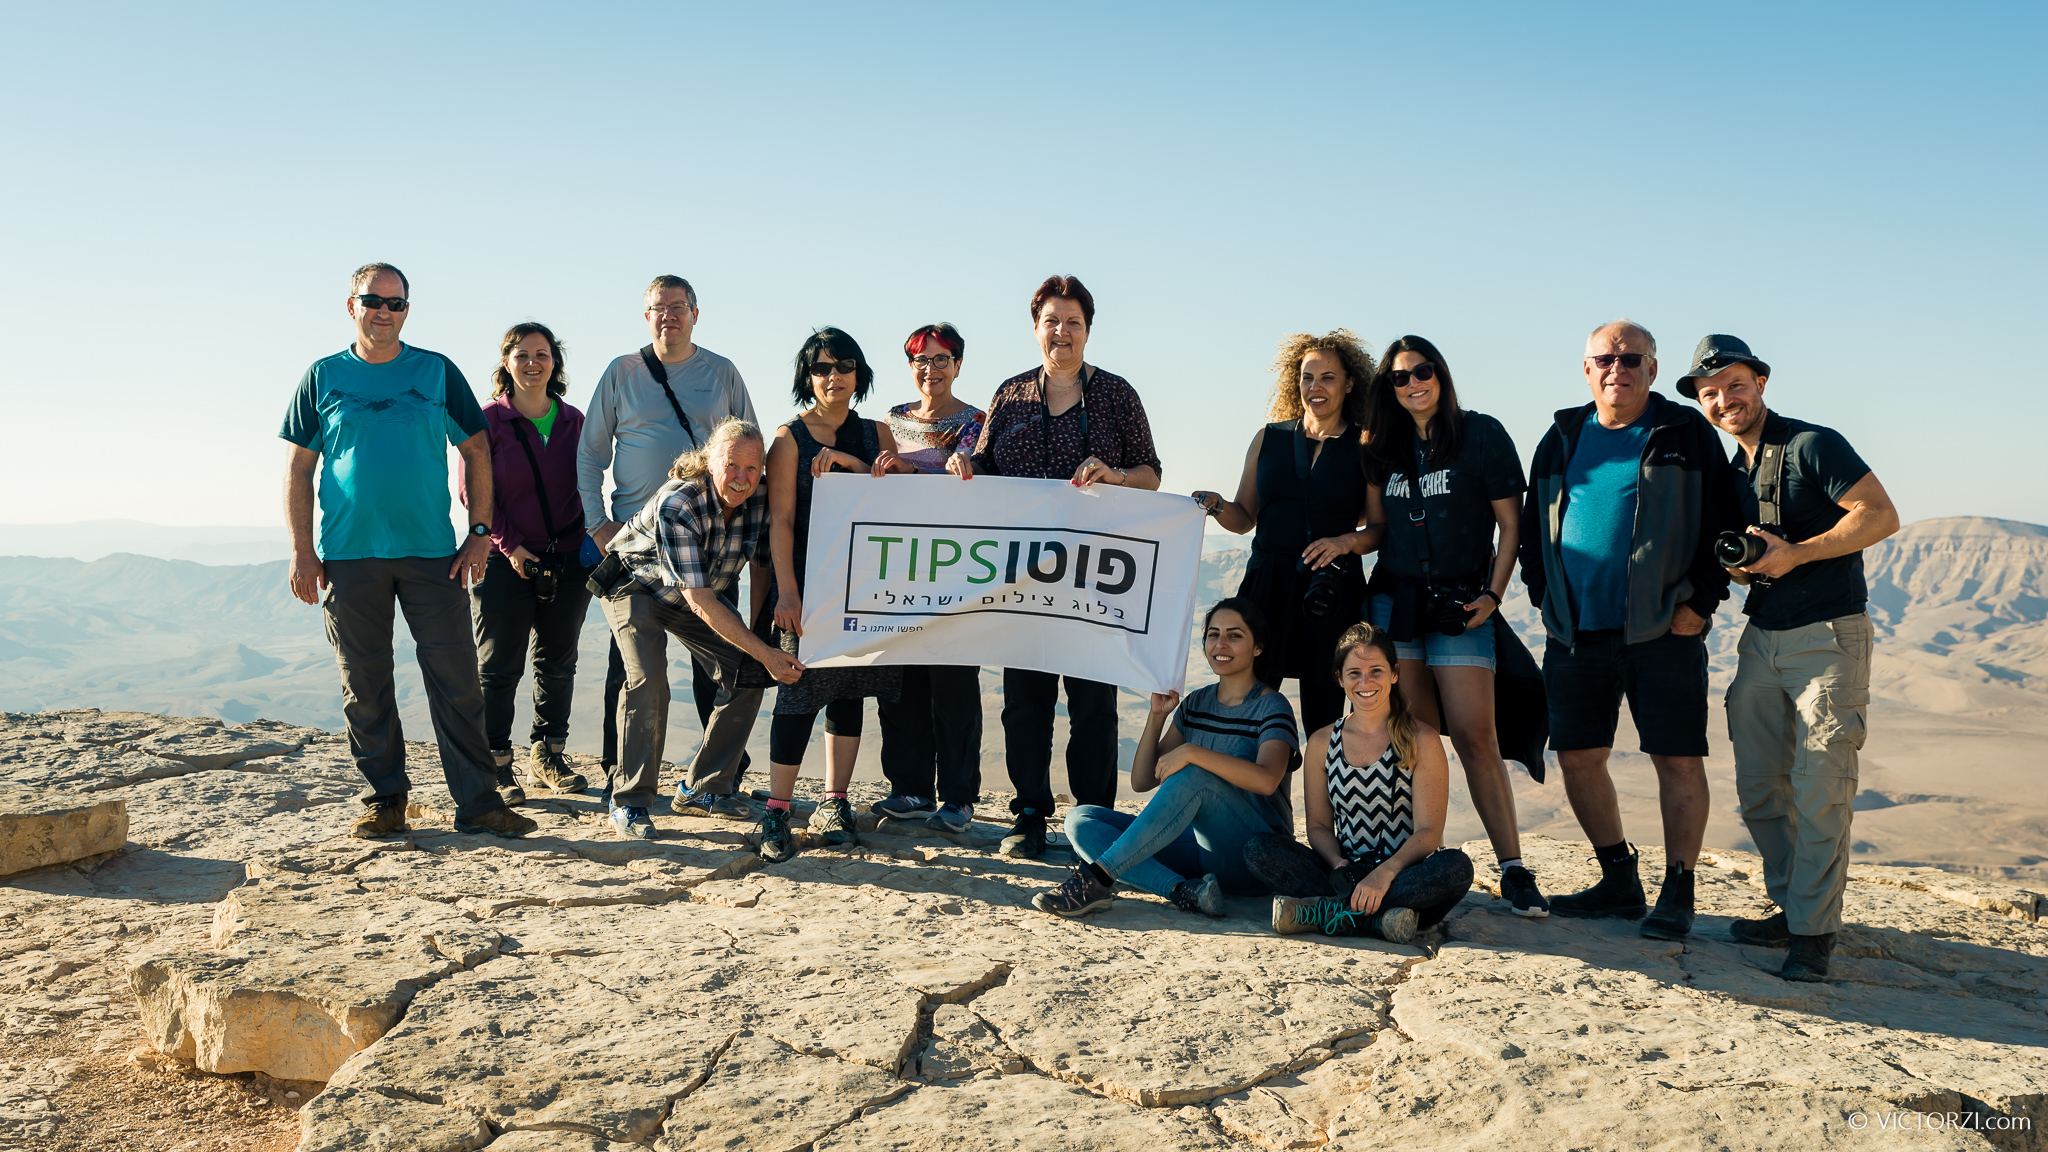 20190803 - Start Workshop w Phototips &